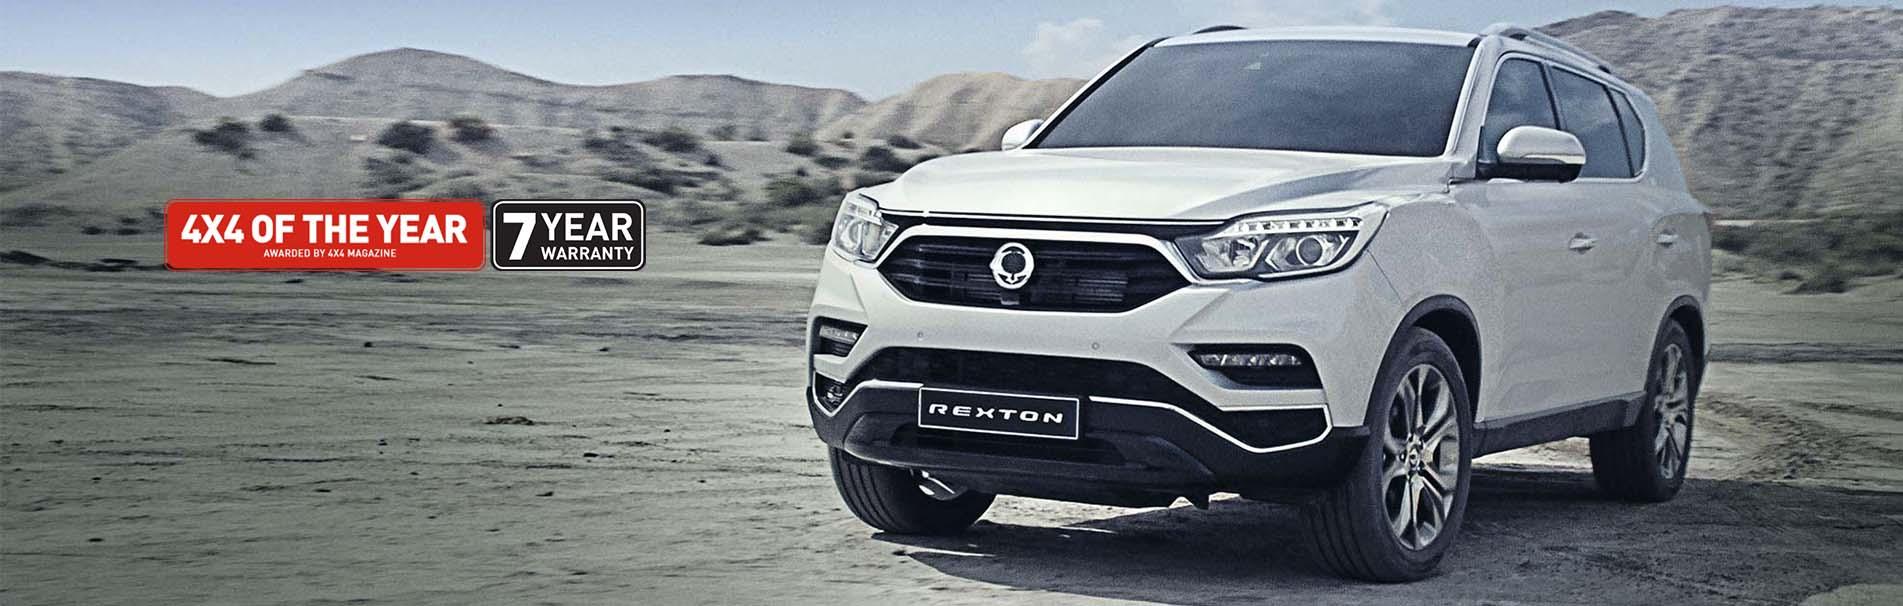 ssangyong-rexton-seven-year-warranty-sli